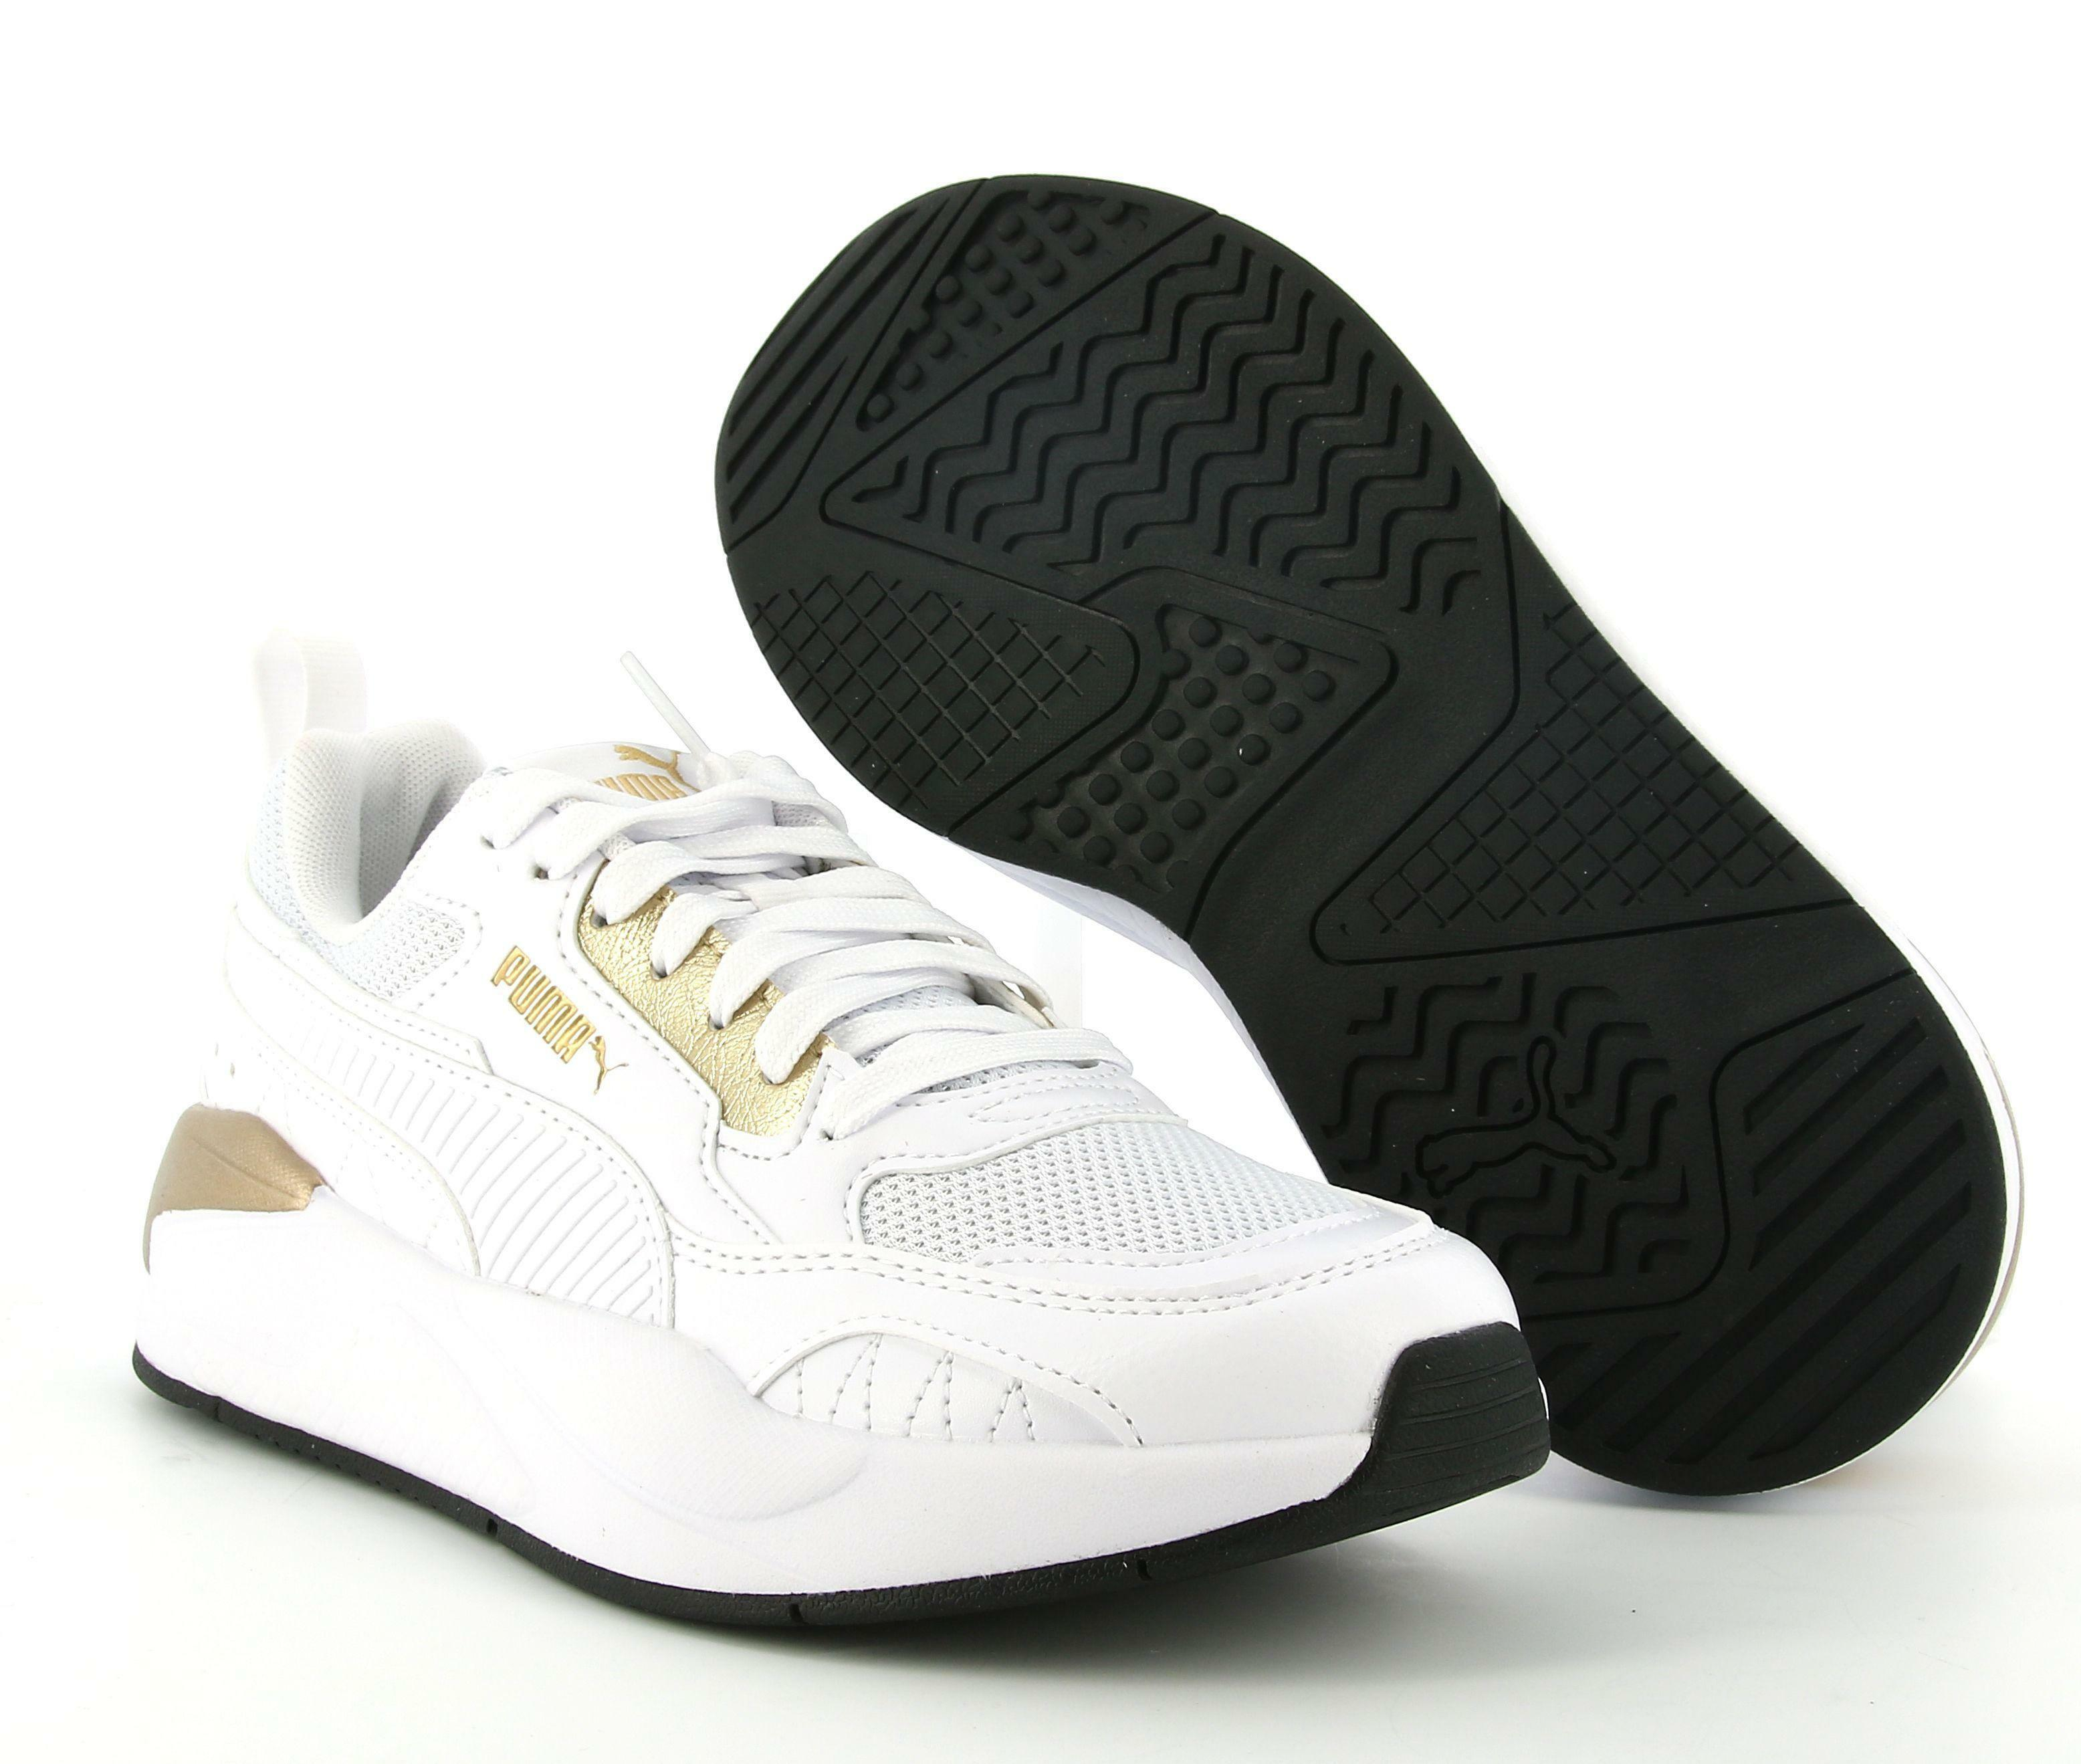 puma puma x-ray 2 square metallic  368855 002 sneaker donna bianca